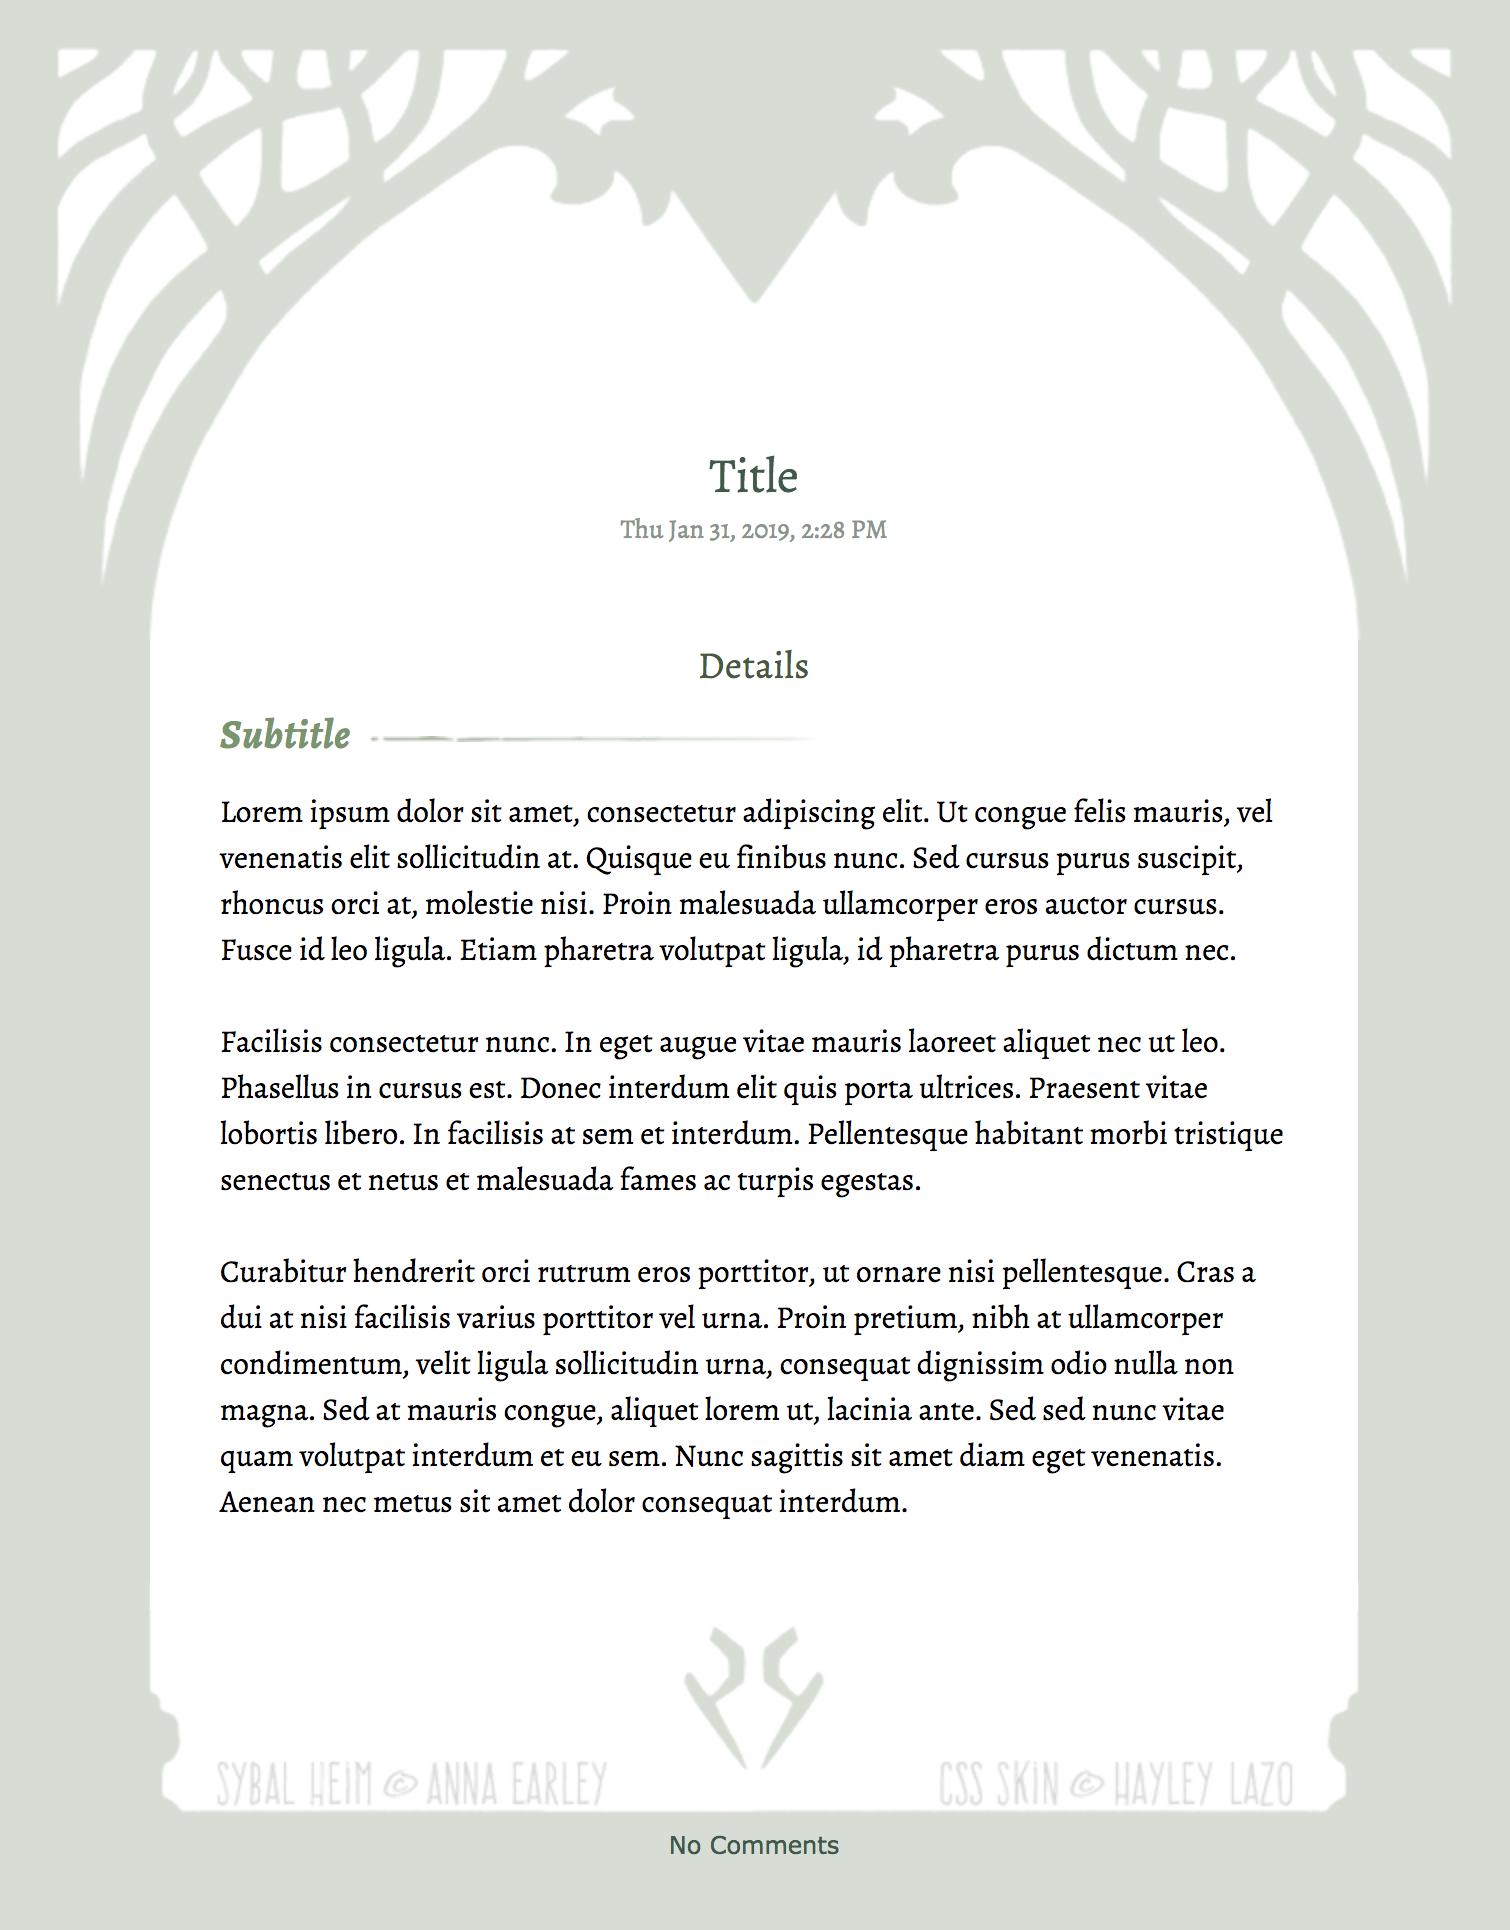 Sybal Heim Literature/Journal CSS Skin